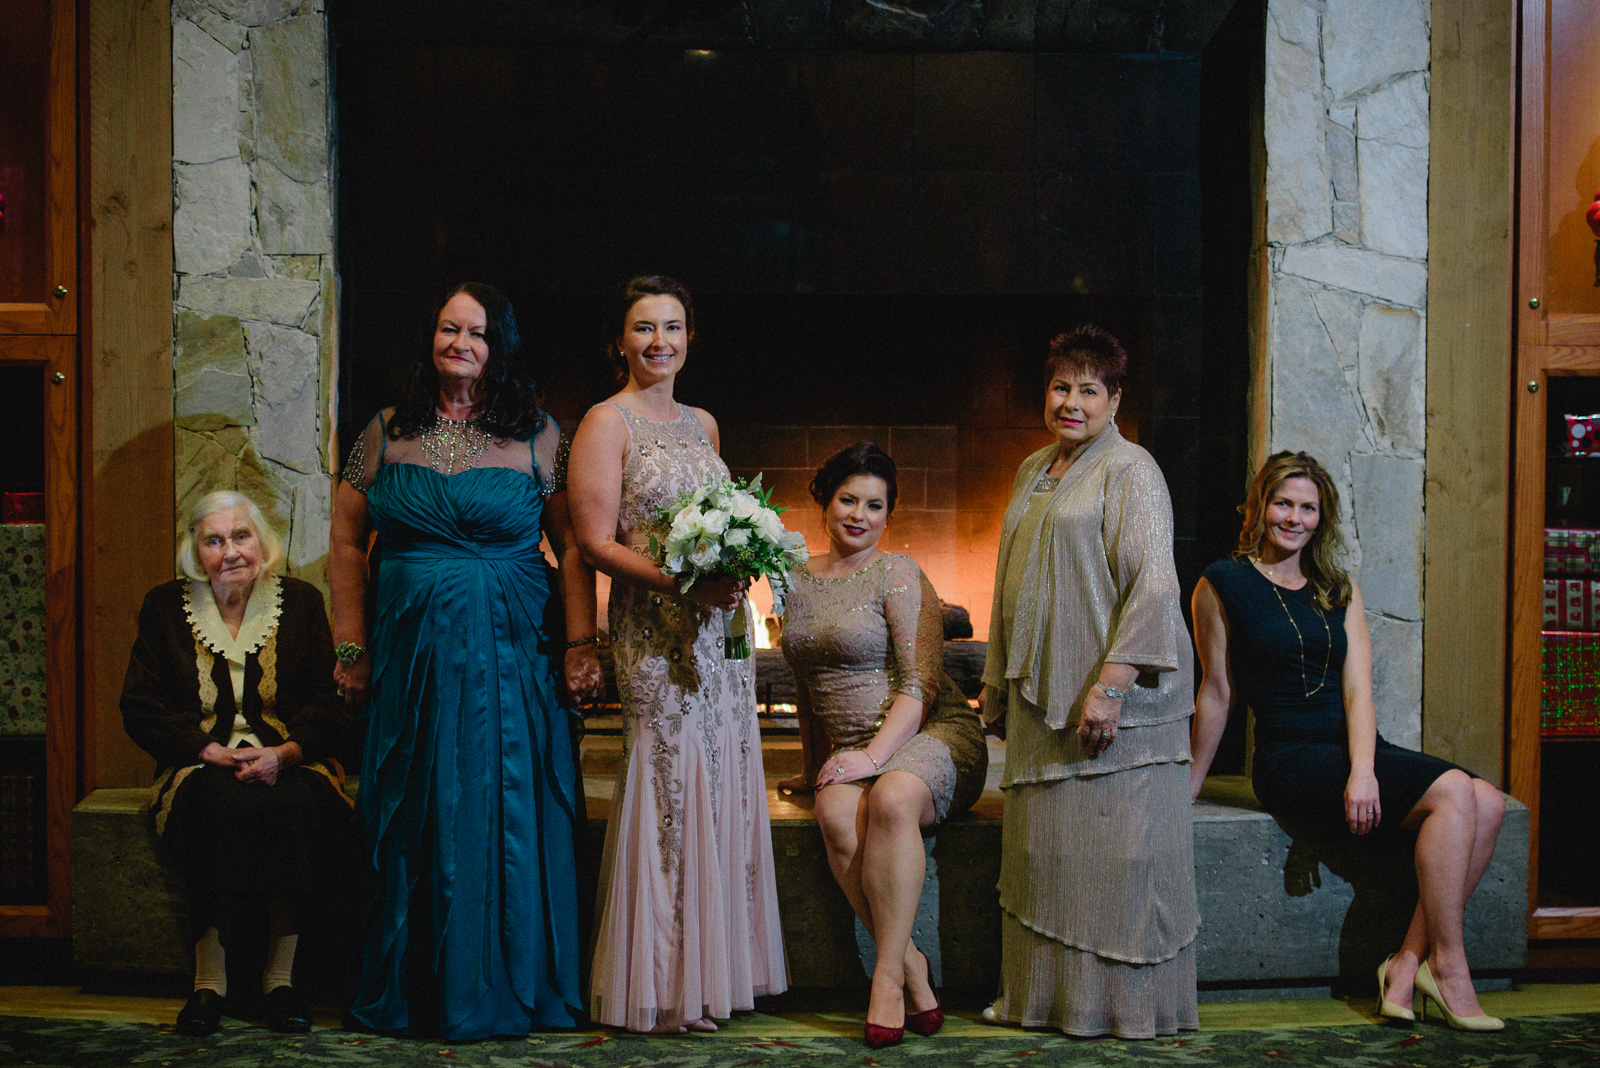 victoria-wedding-photographer-westwood-plateau-wedding-12.jpg